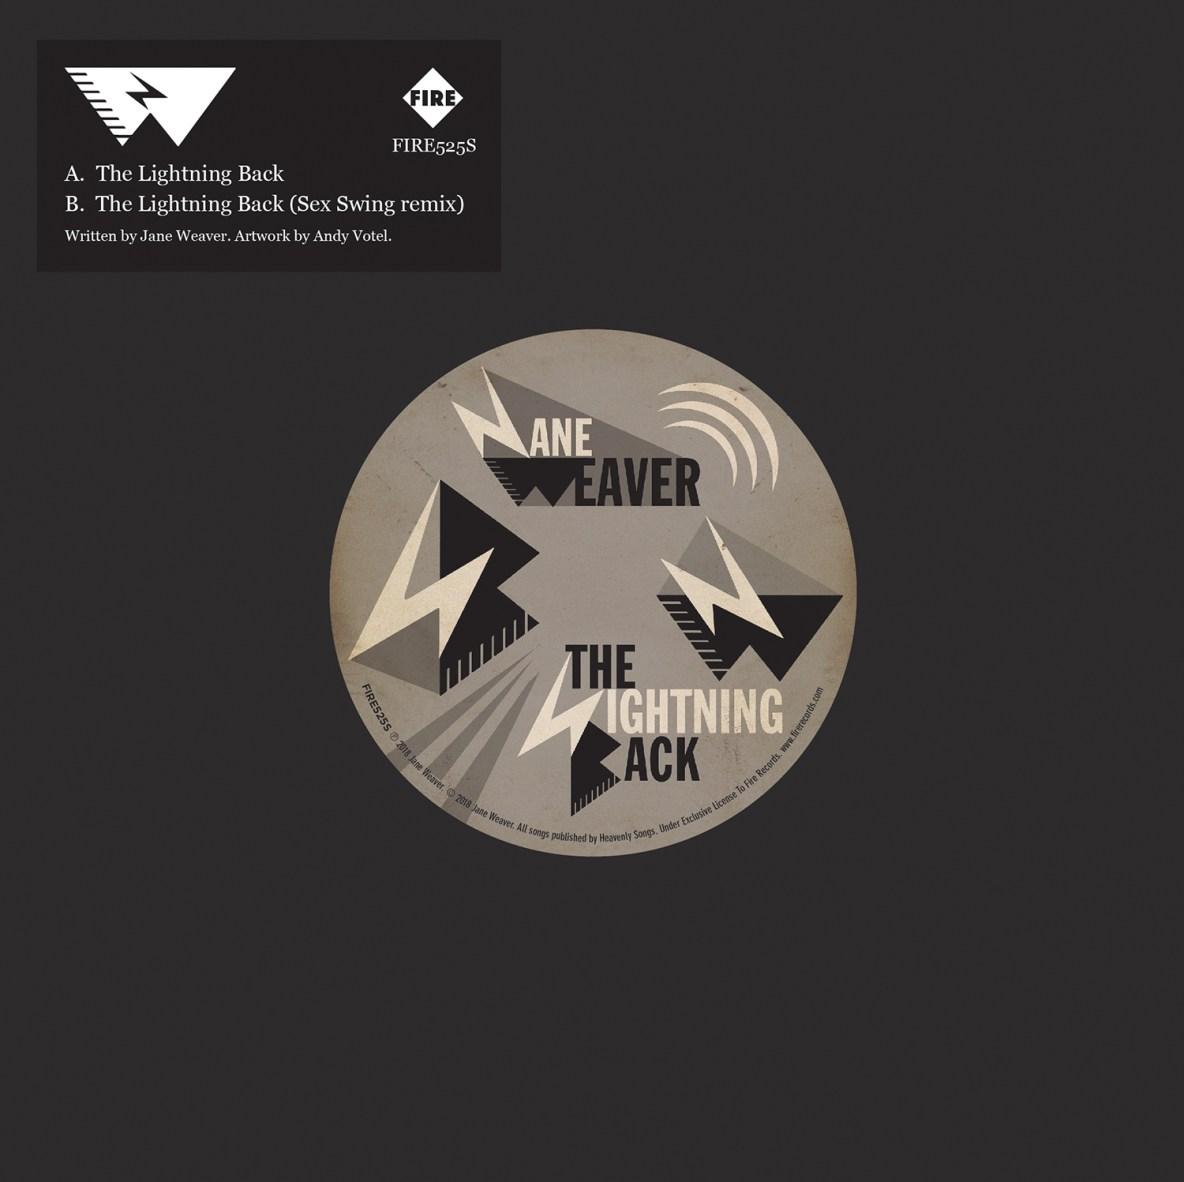 Jane Weaver – FIRE RECORDS